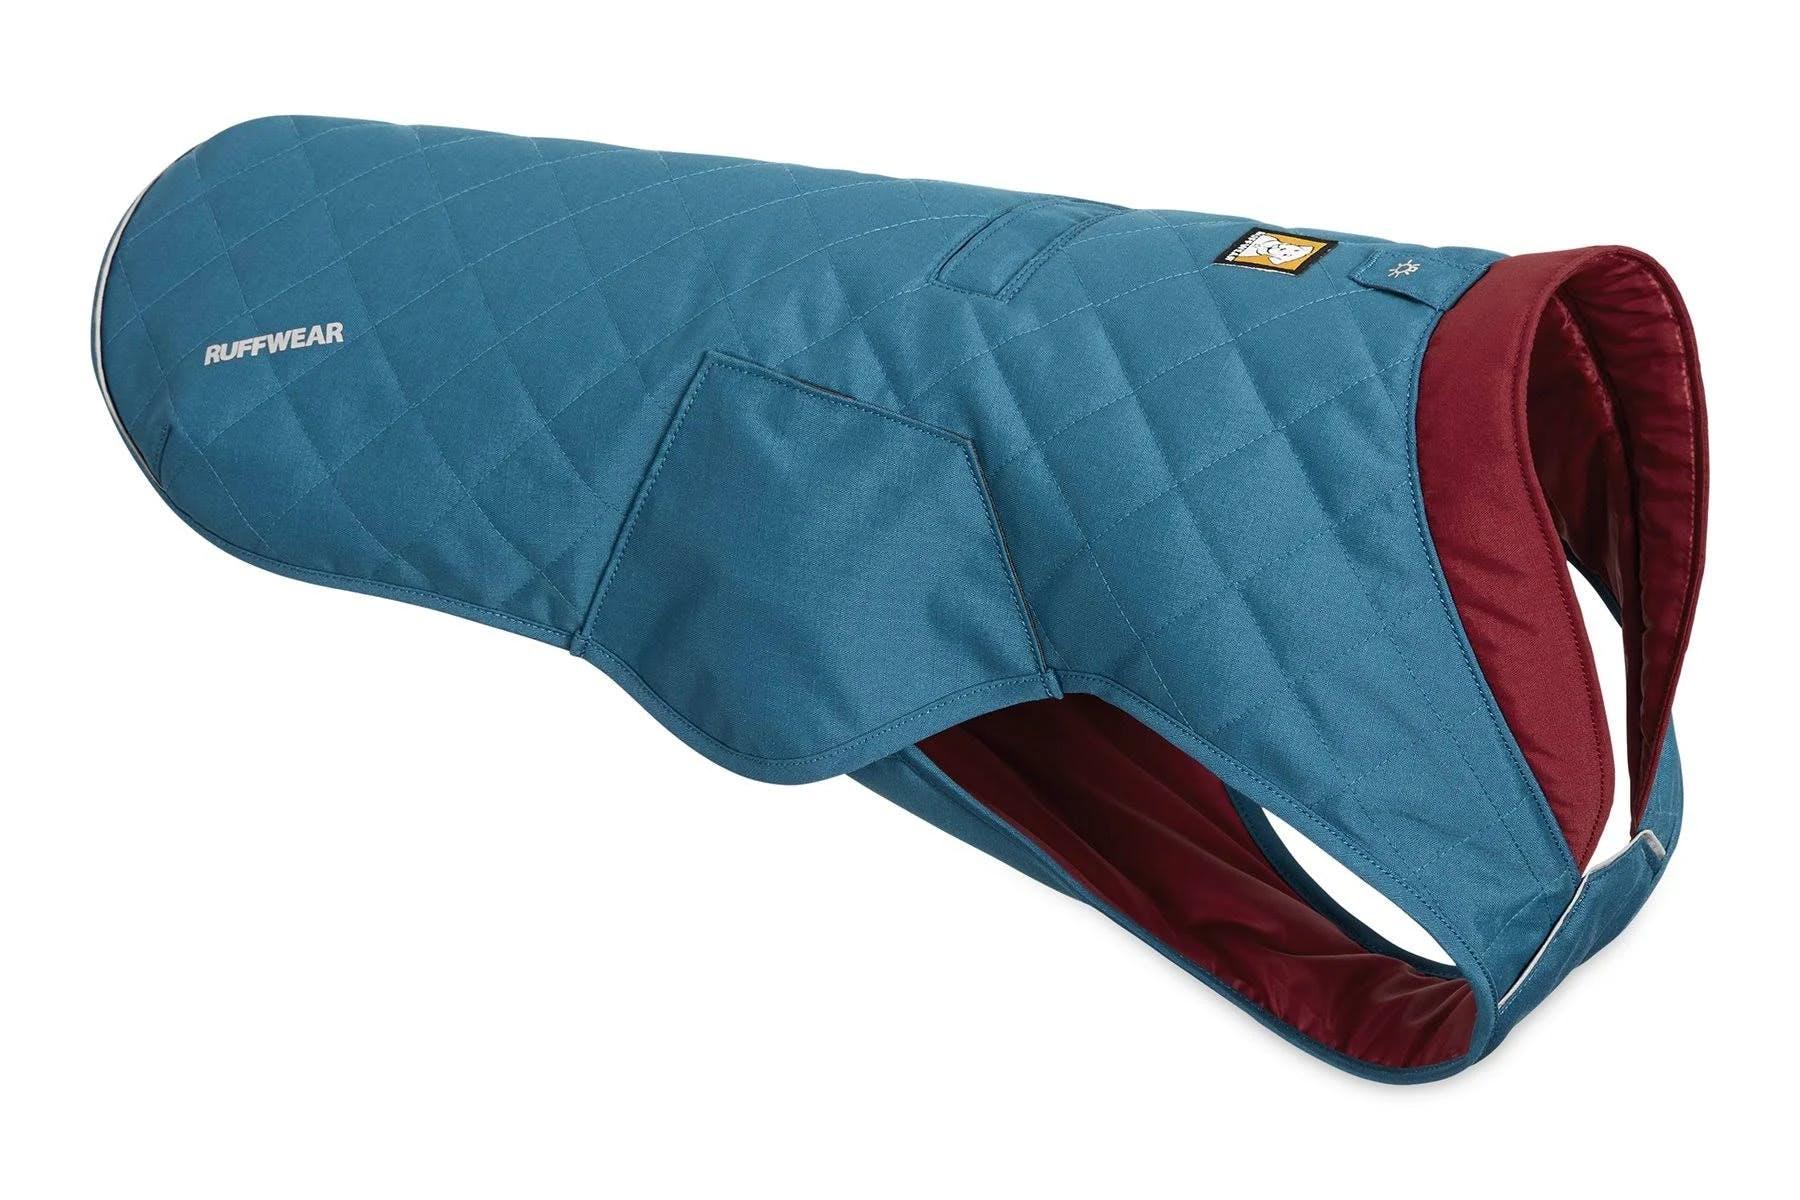 Ruffwear - Stumptown Jacket - Medium - Metolius Blue